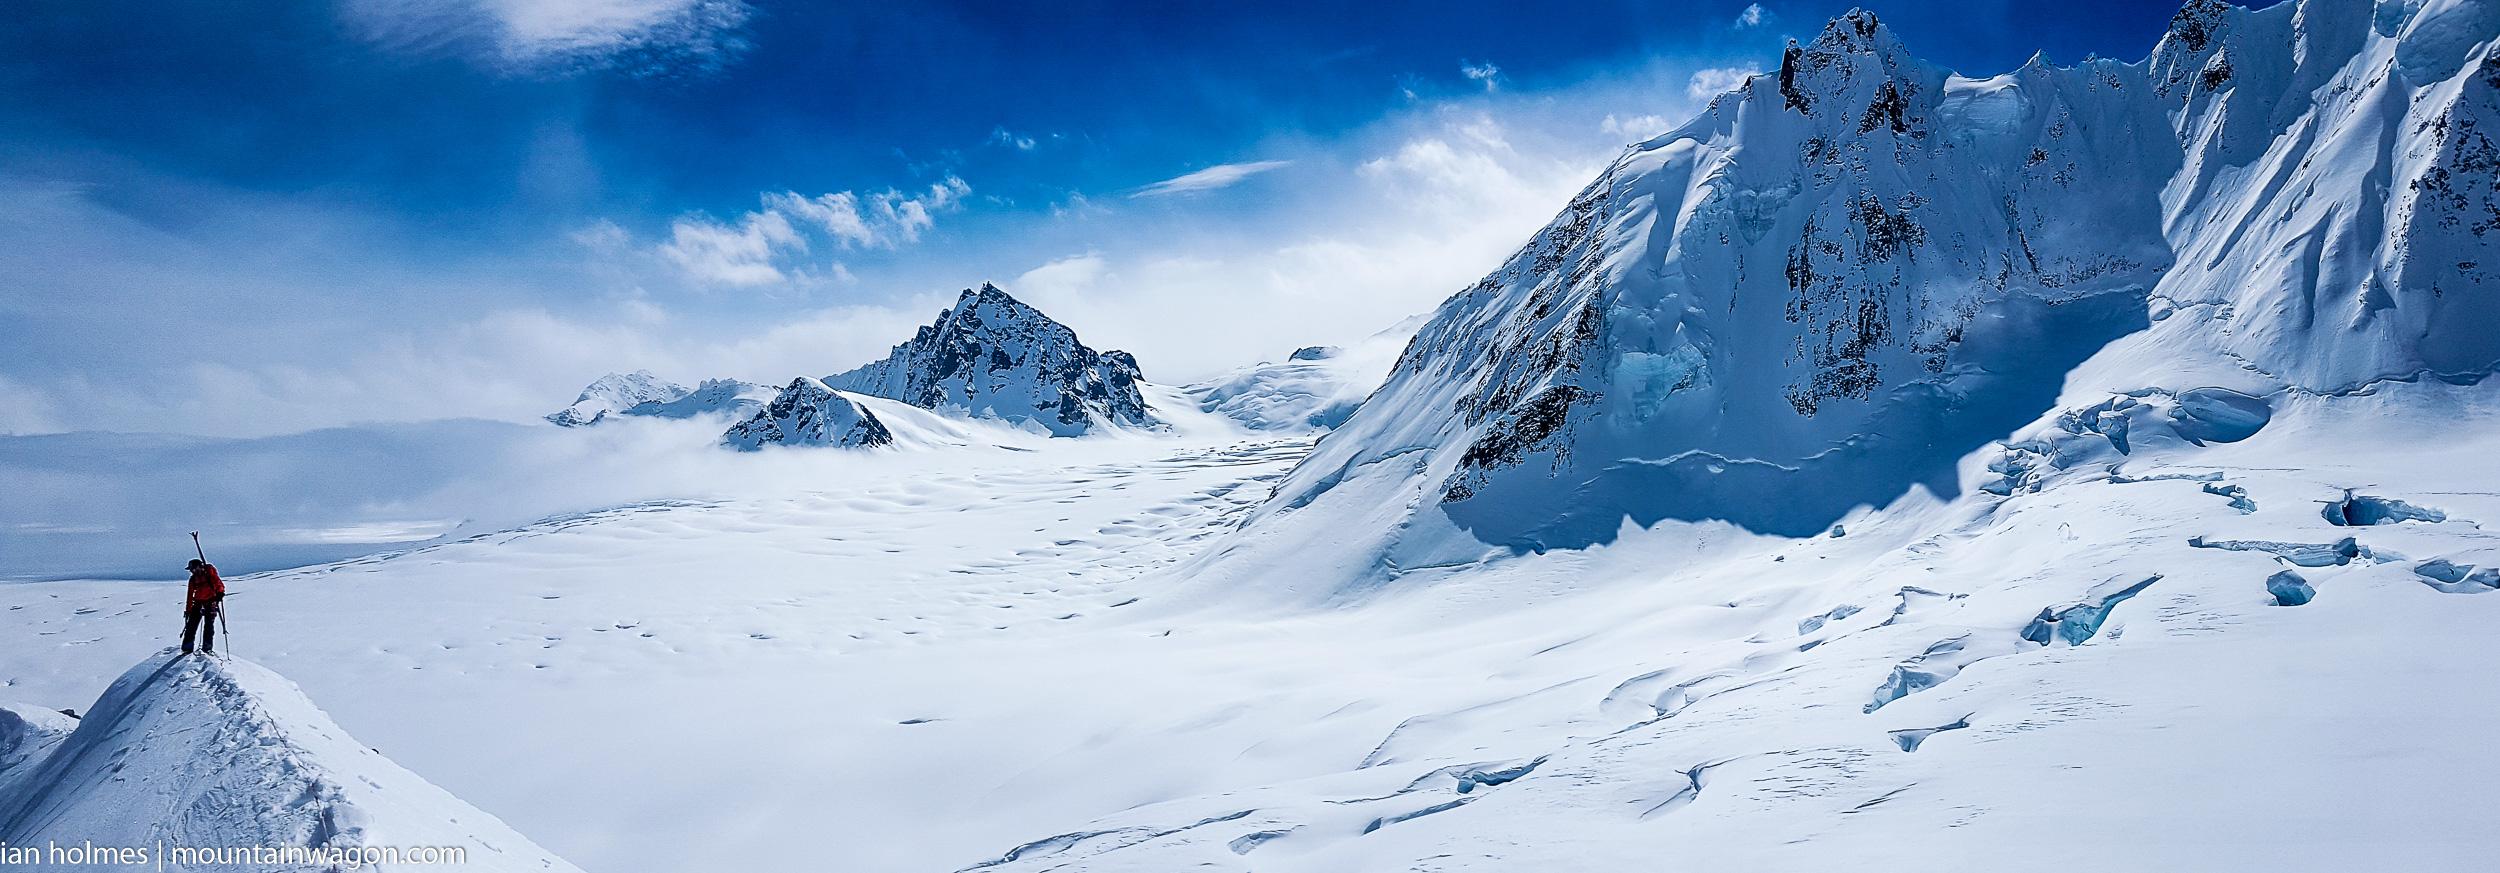 kluane national park skiing mountaineering